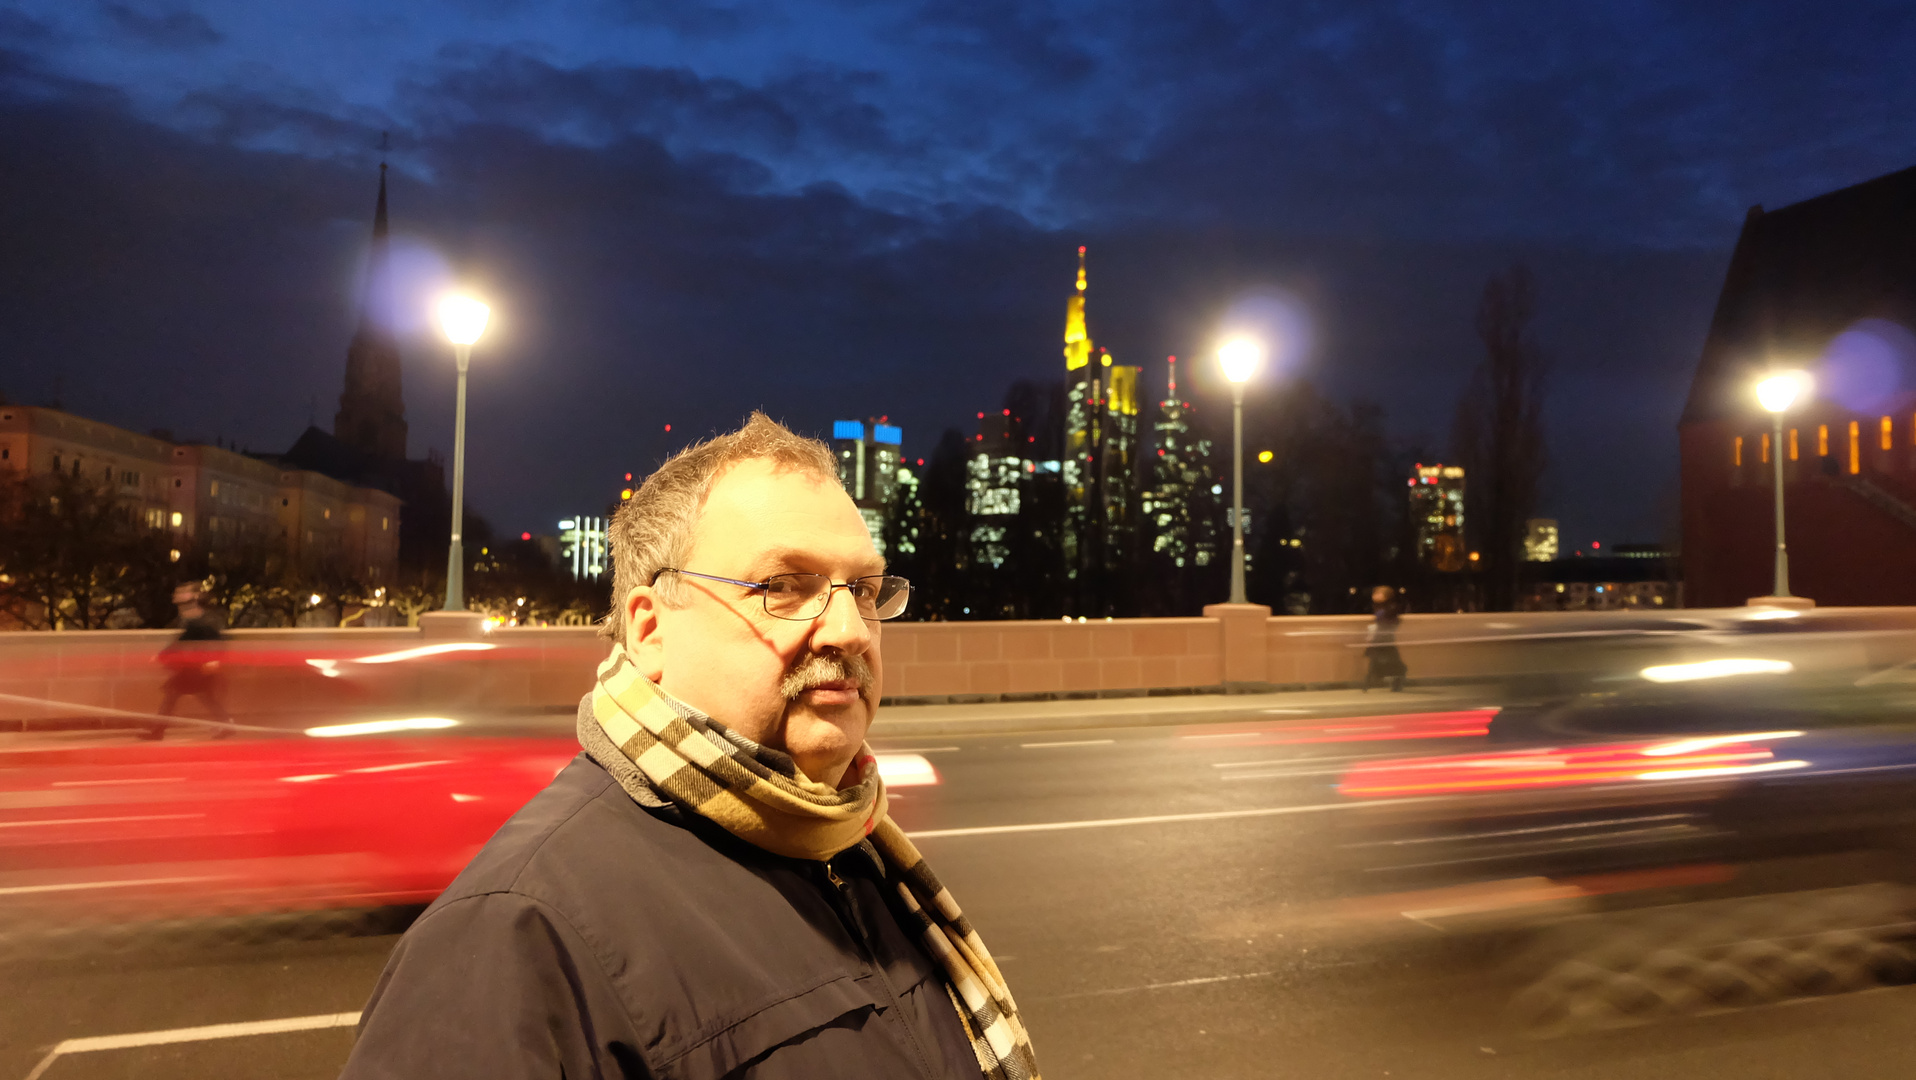 Frankfurt (3) , Selbstporträt und Skyline / Francfort, autoportrait et skyline